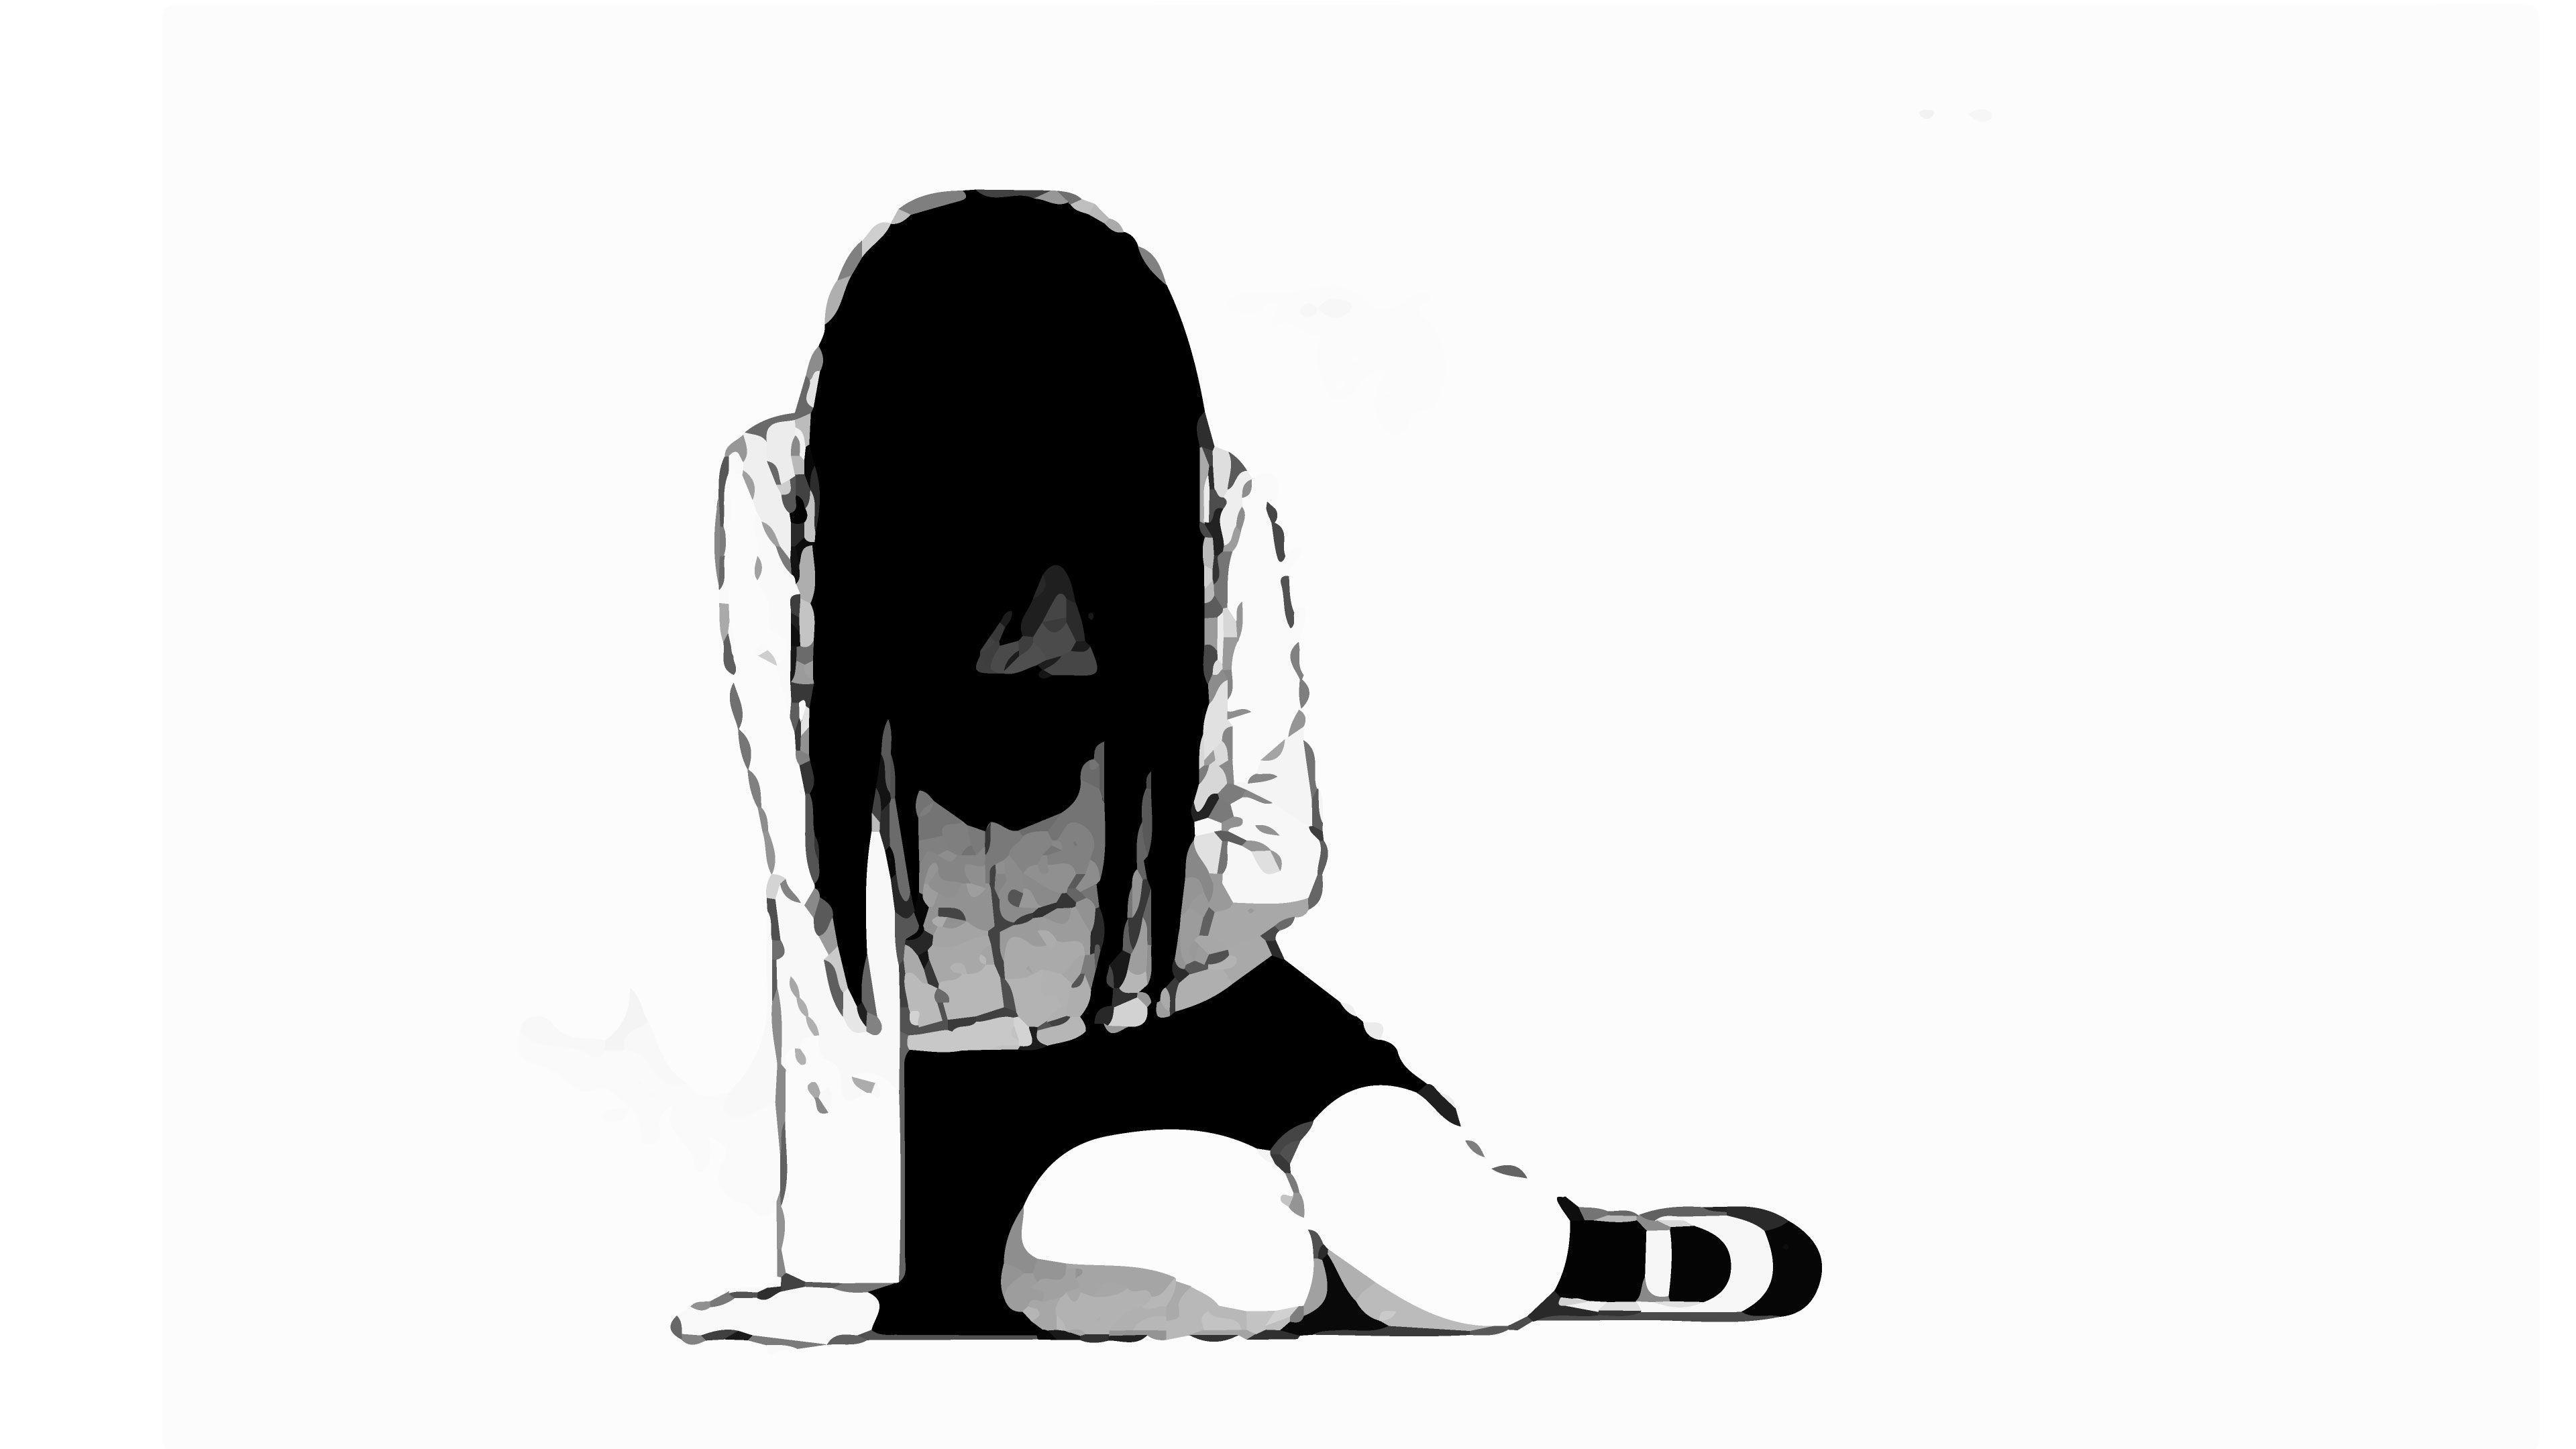 Alone sad anime wallpapers top free alone sad anime